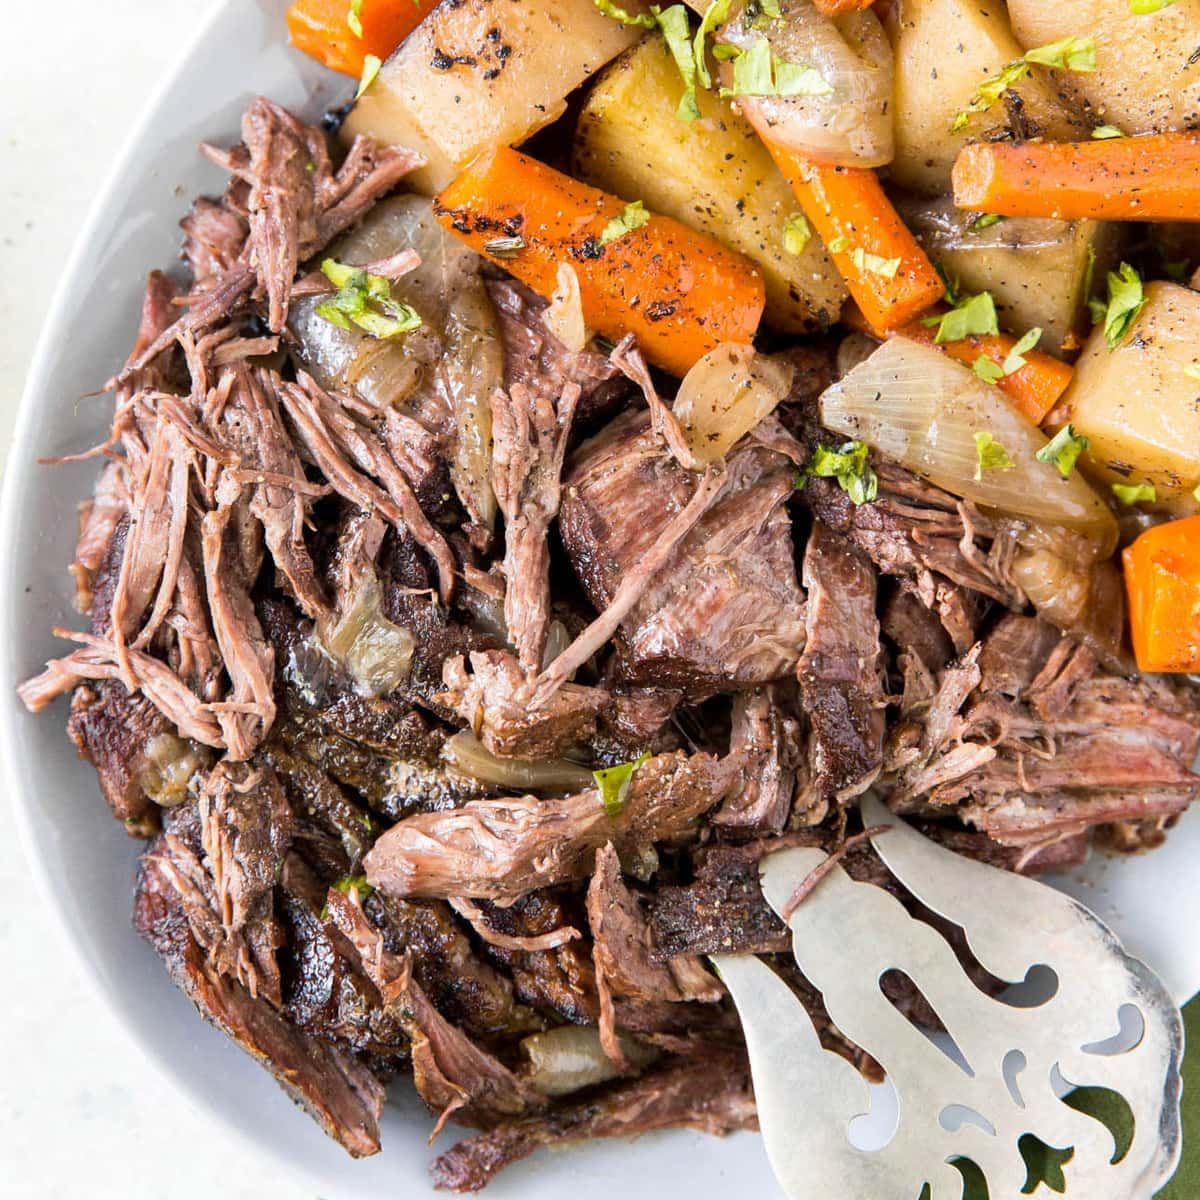 Dutch Oven Pot Roast Easy And Full Of Flavor Yellowblissroad Com